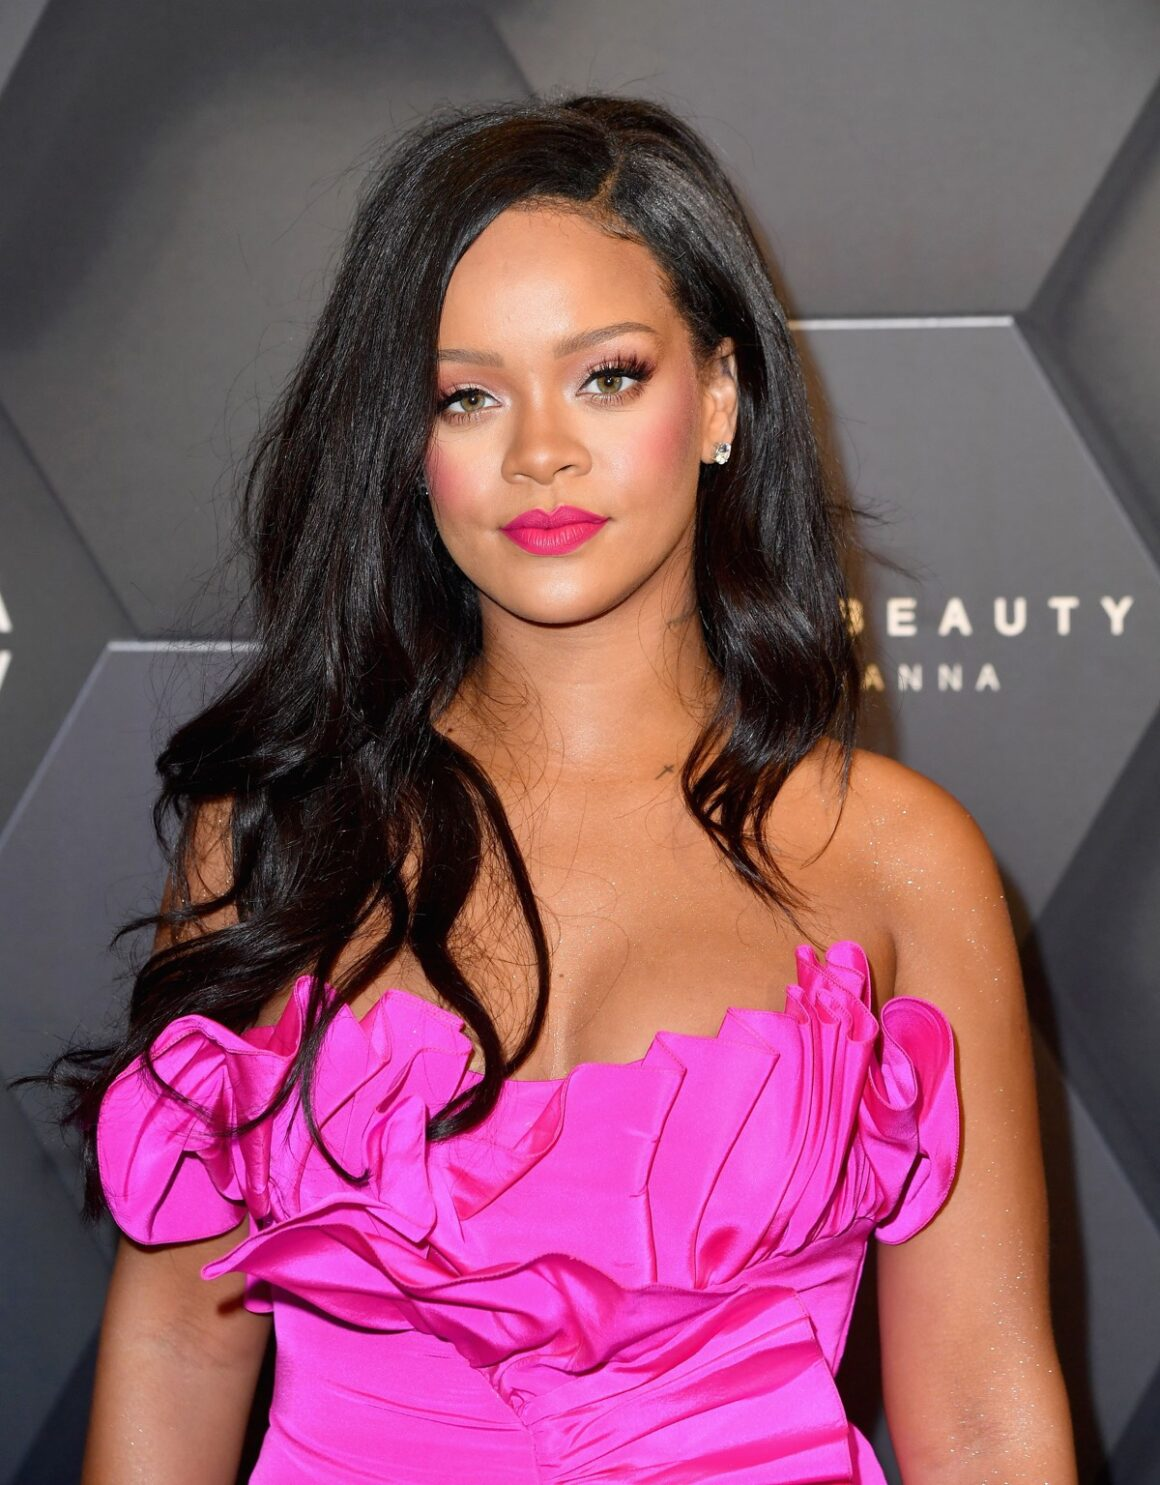 Rihanna attends the Fenty Beauty by Rihanna event